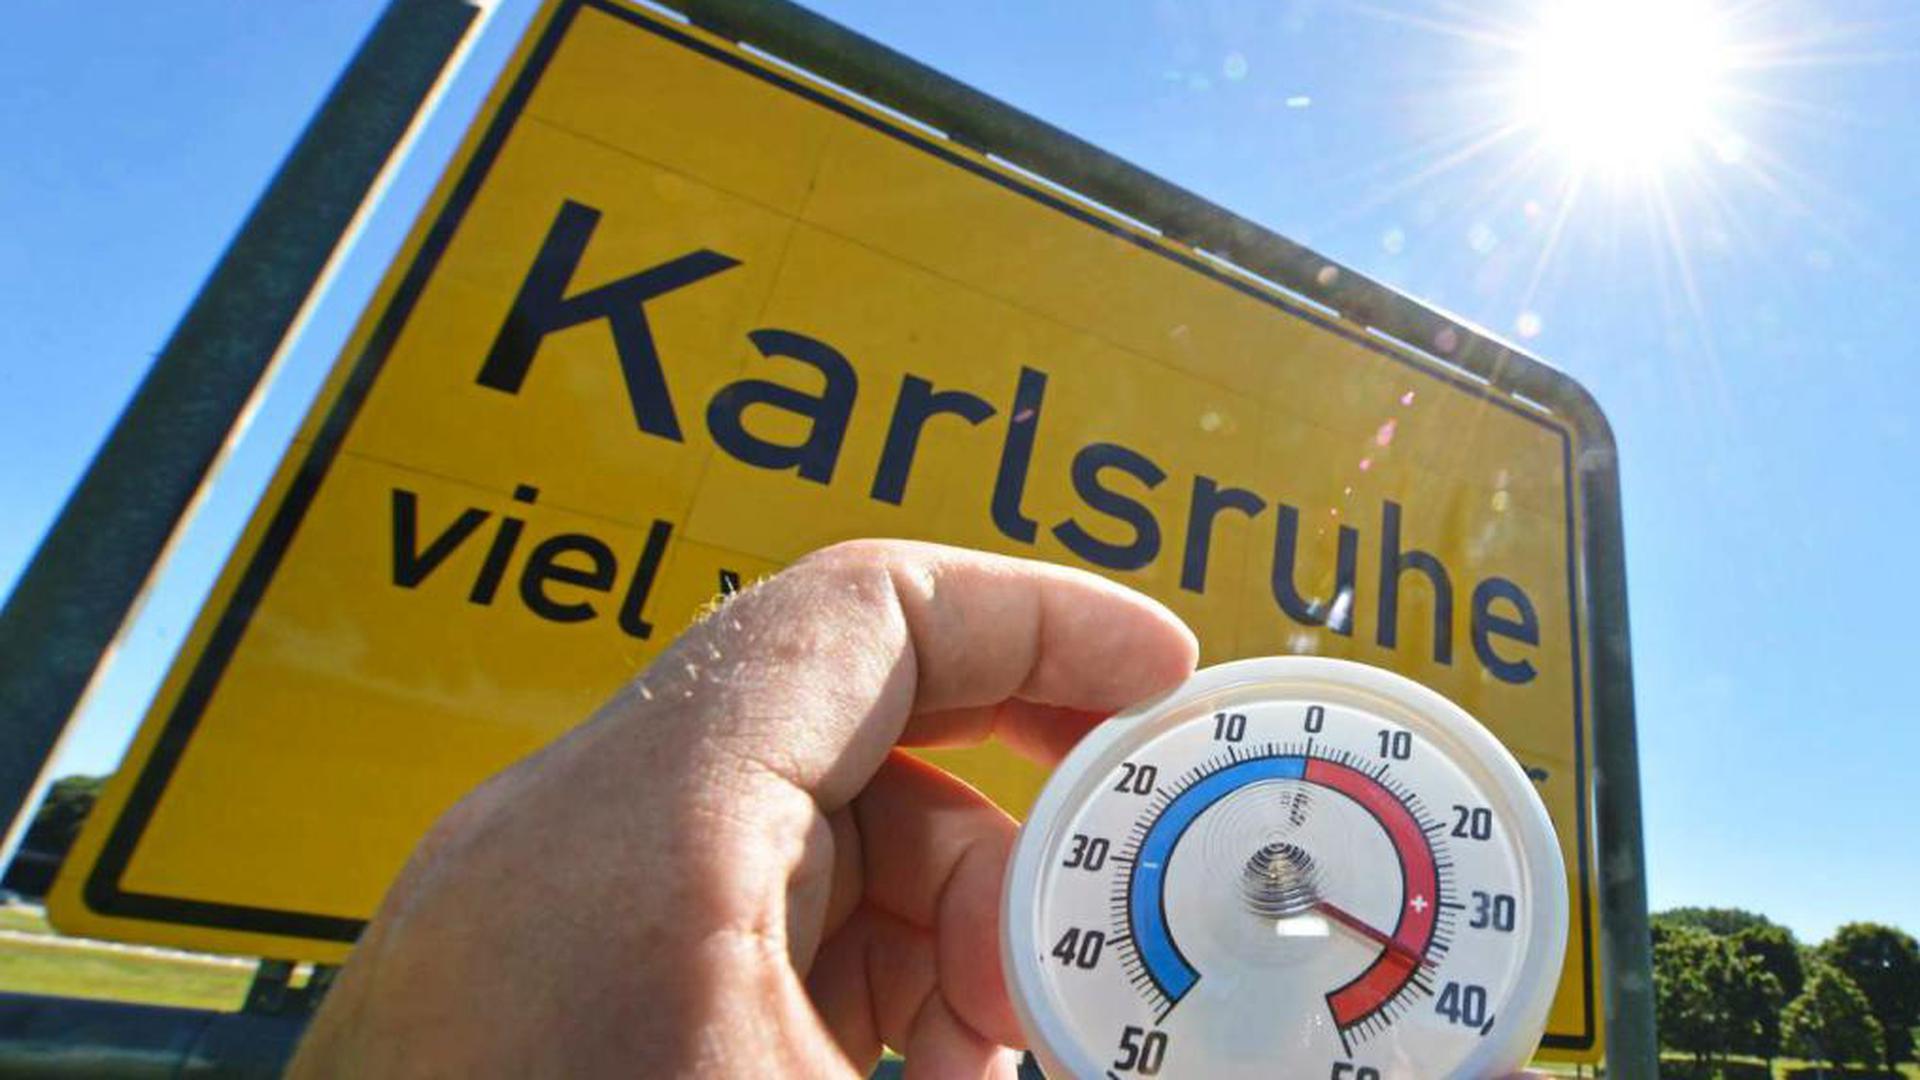 Wetterstation Karlsruhe